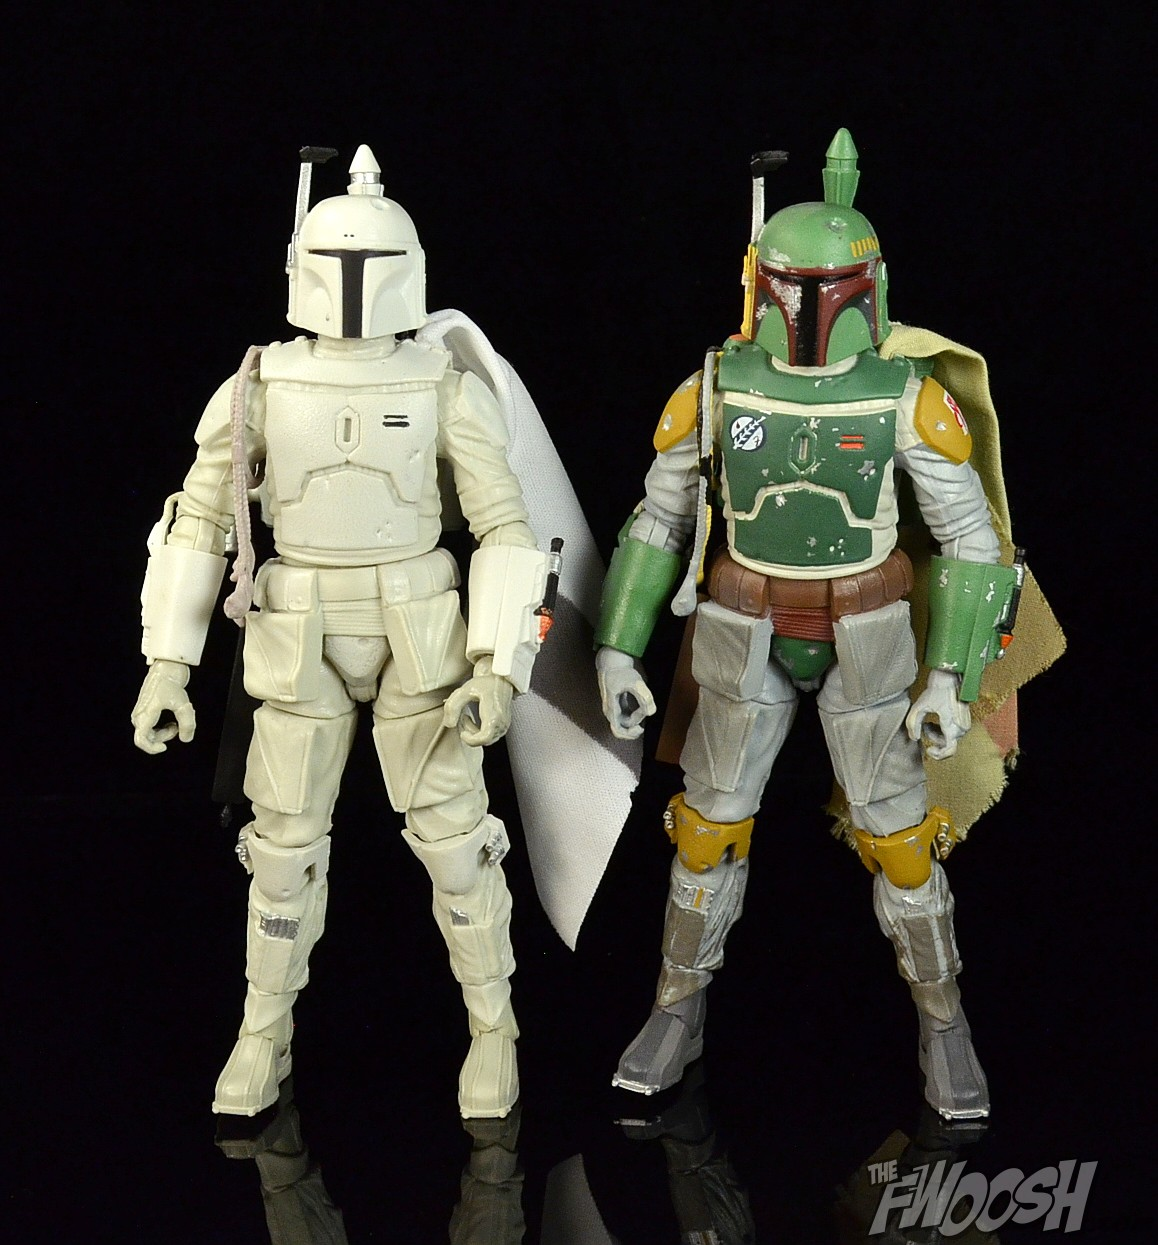 action figure Neuf Scellé Star Wars Black Series Boba Fett Prototype Armor 6 in environ 15.24 cm